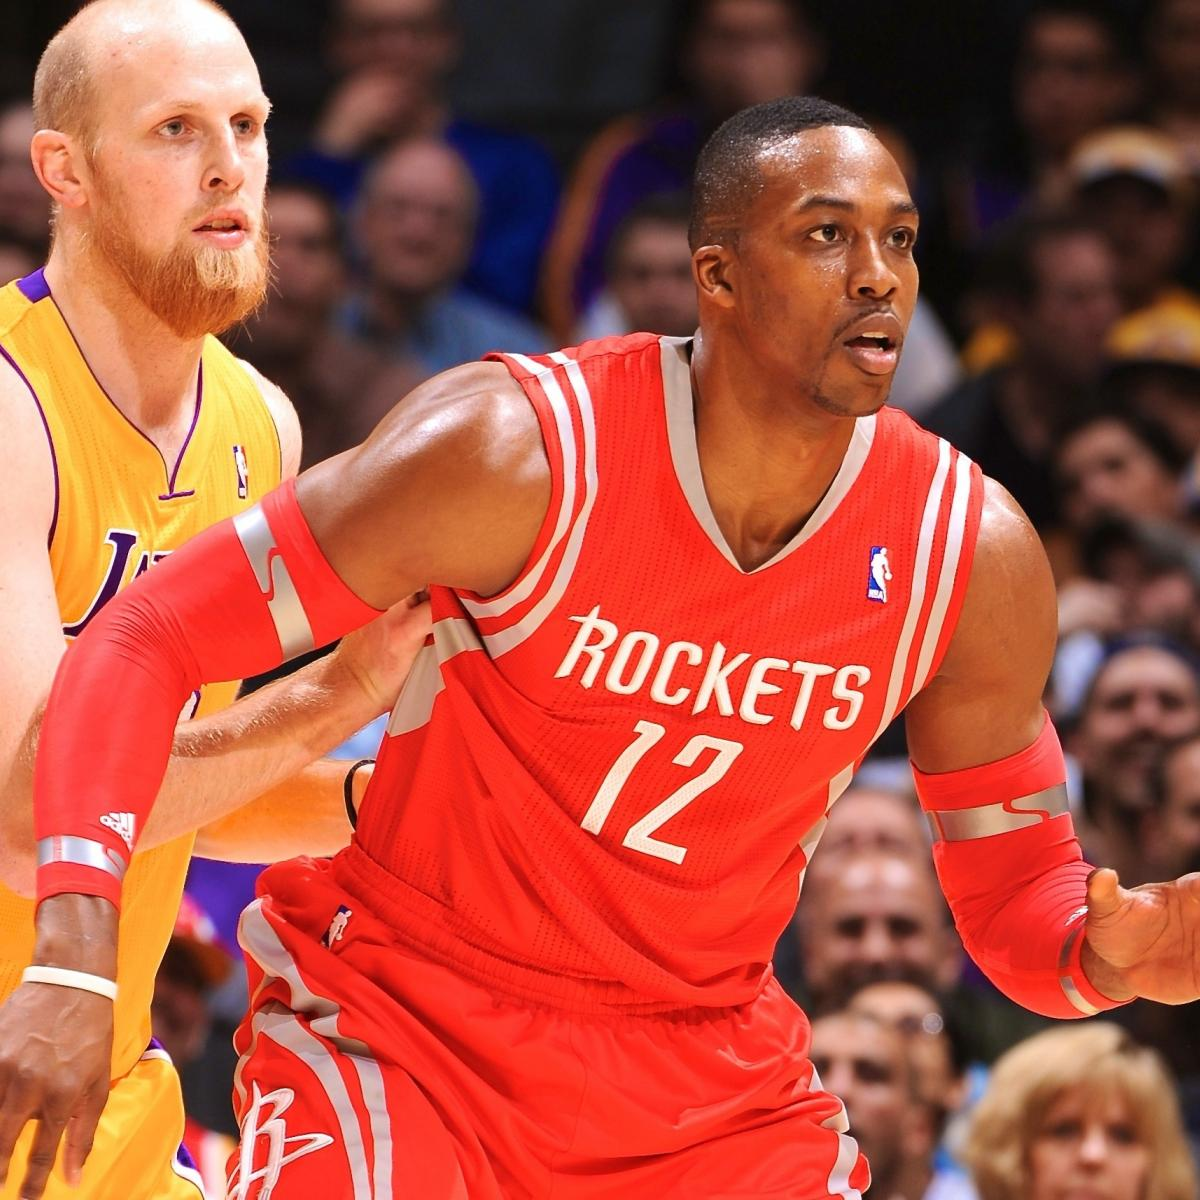 Houston Rockets X Lakers: Houston Rockets Vs. Los Angeles Lakers: Live Score And